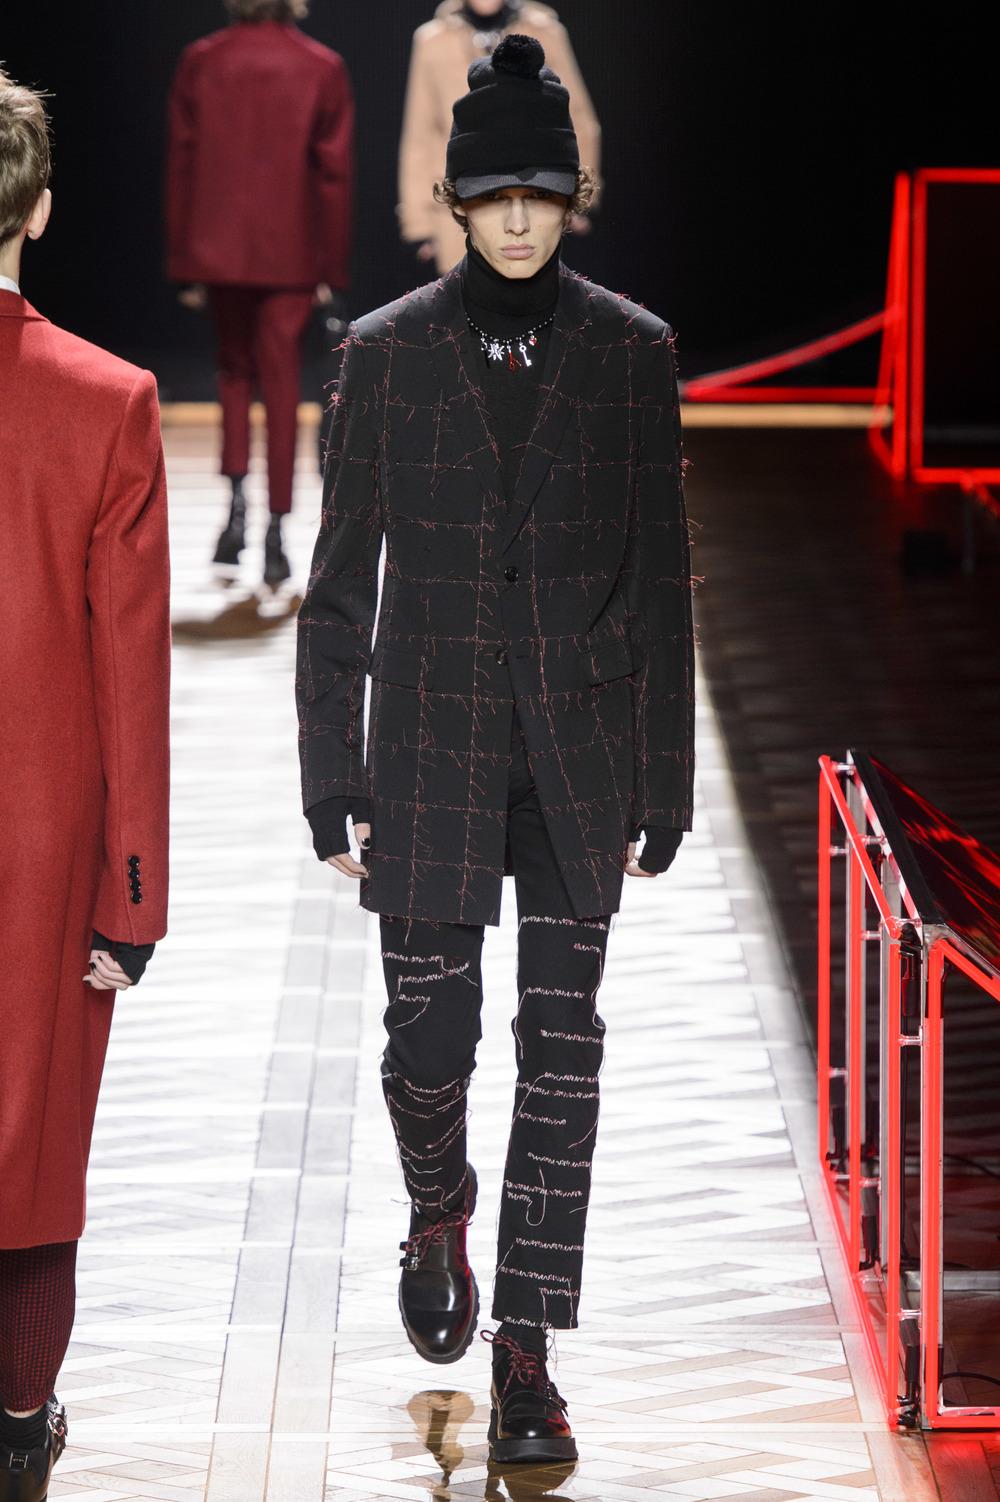 Dior_Homme_Hiver2016-17_look_24.JPG